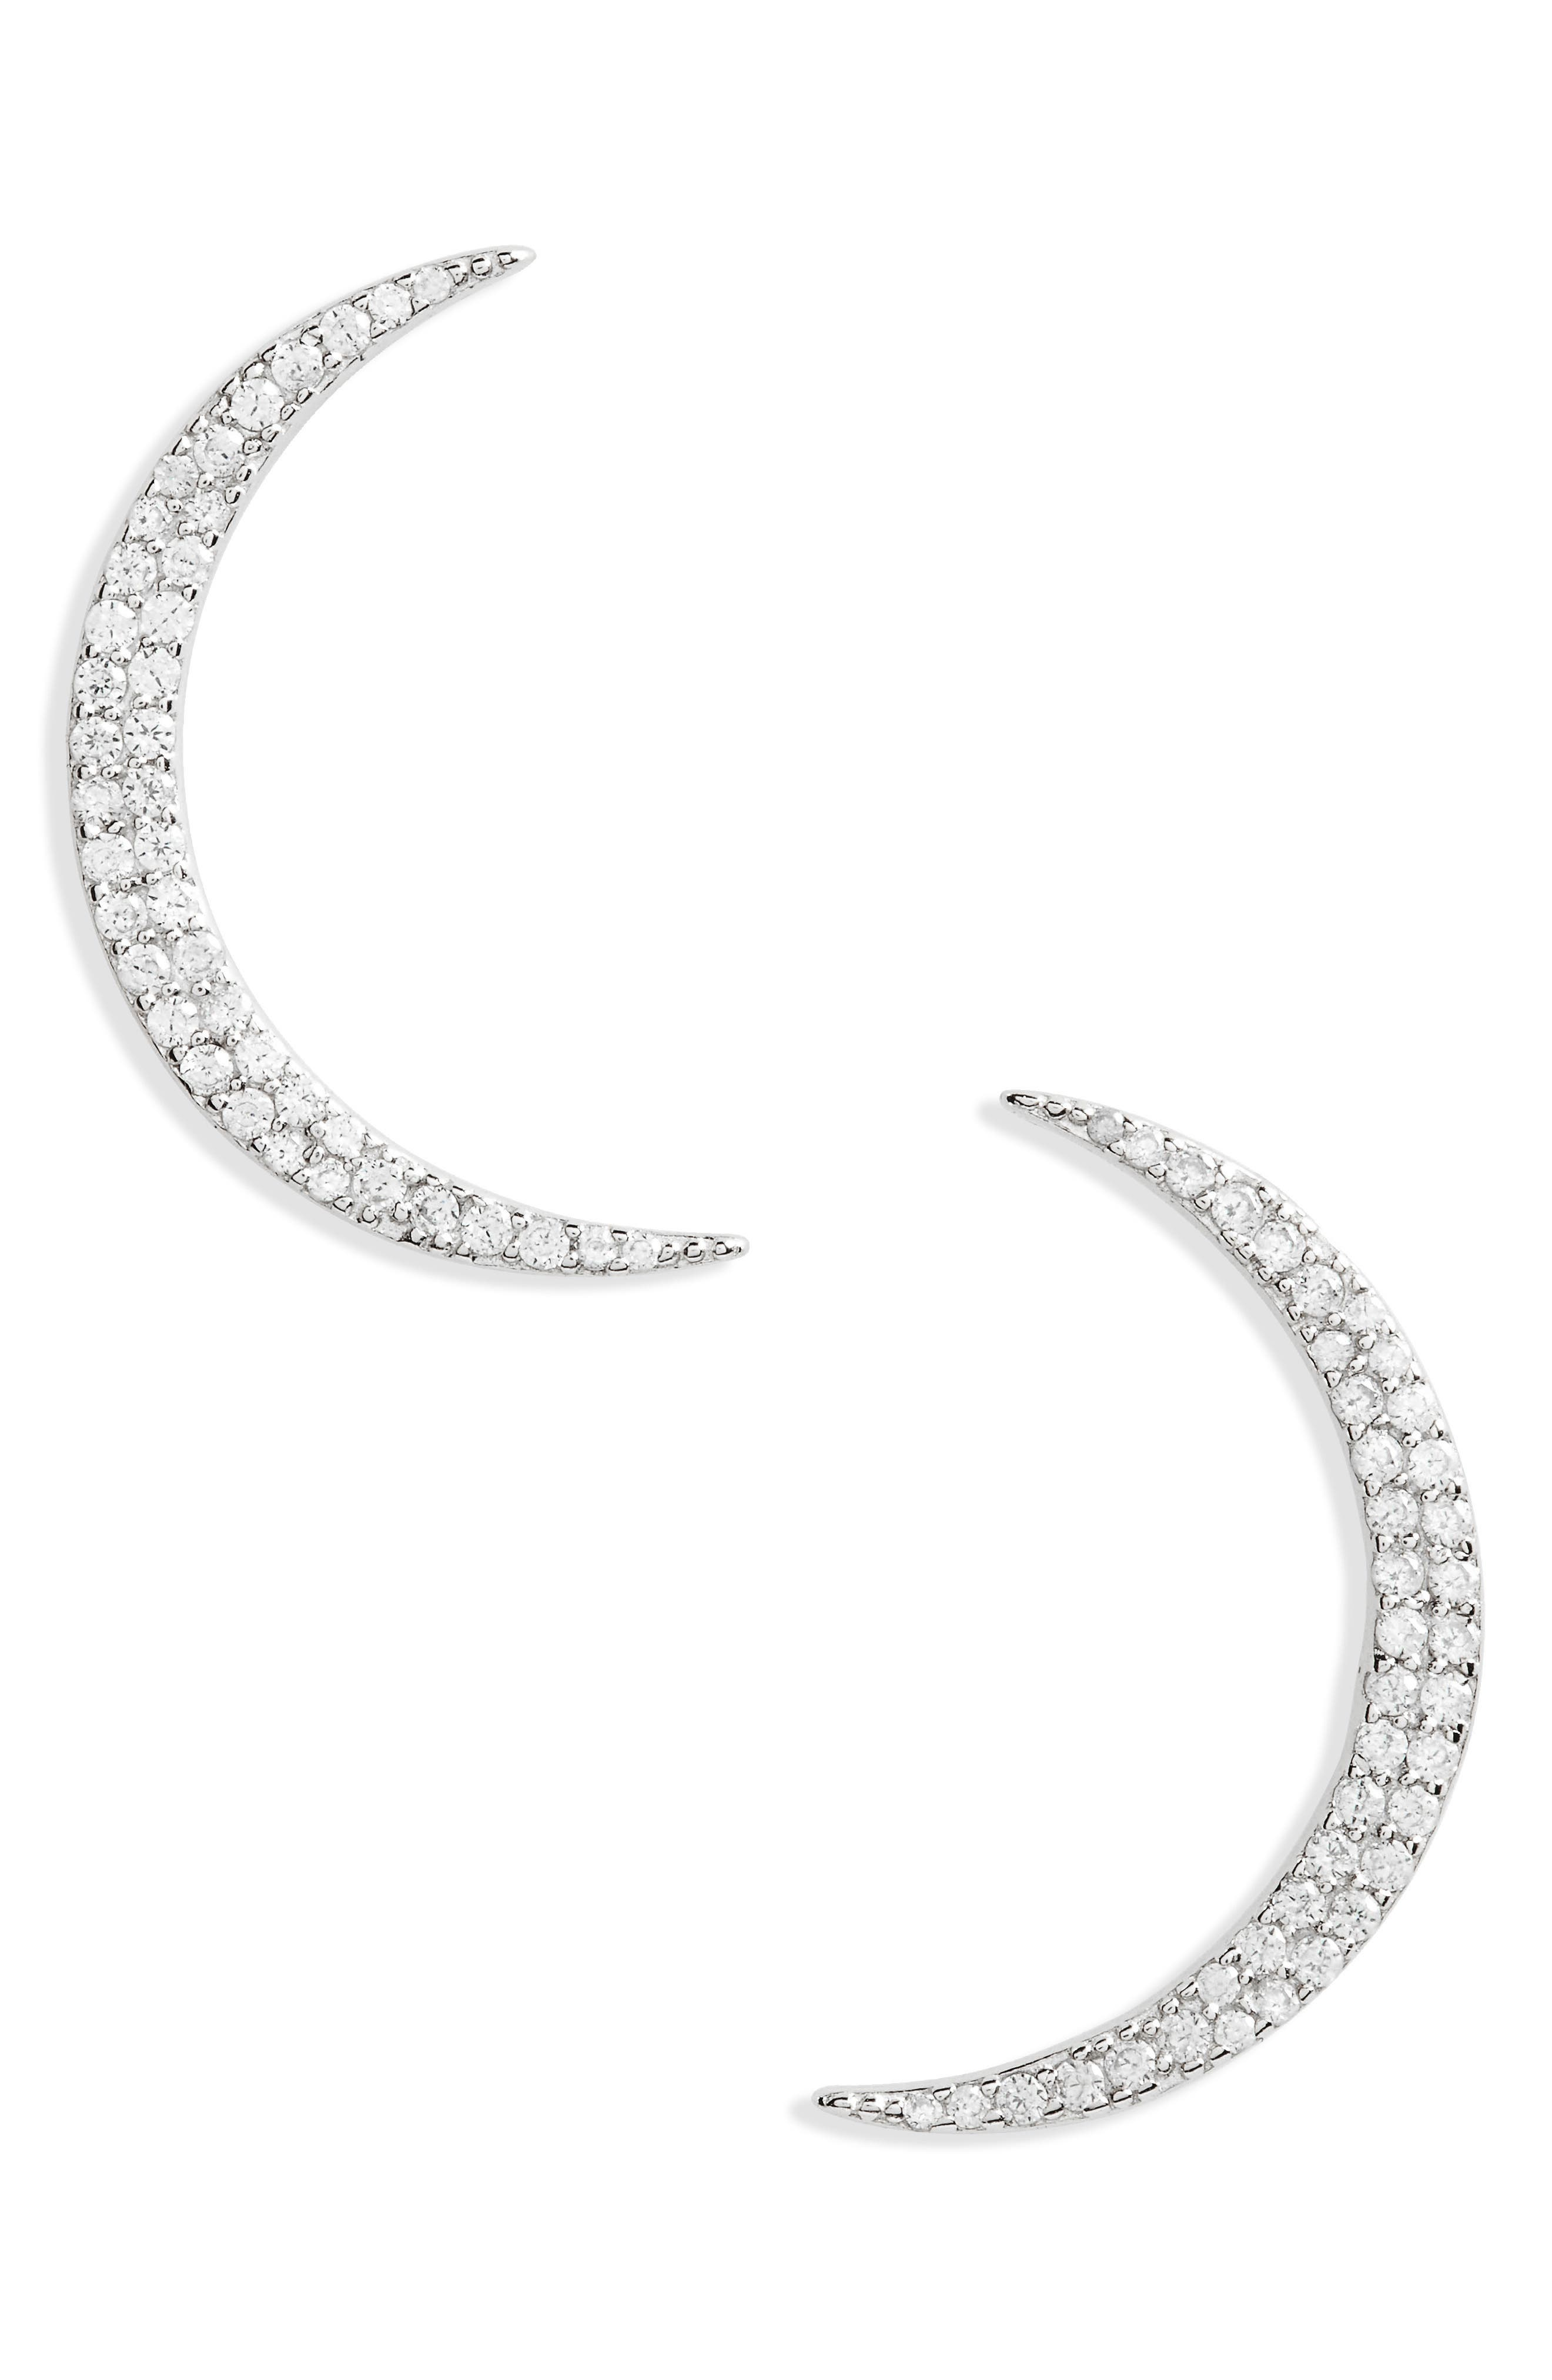 Pavé Crescent Earrings,                             Main thumbnail 1, color,                             040